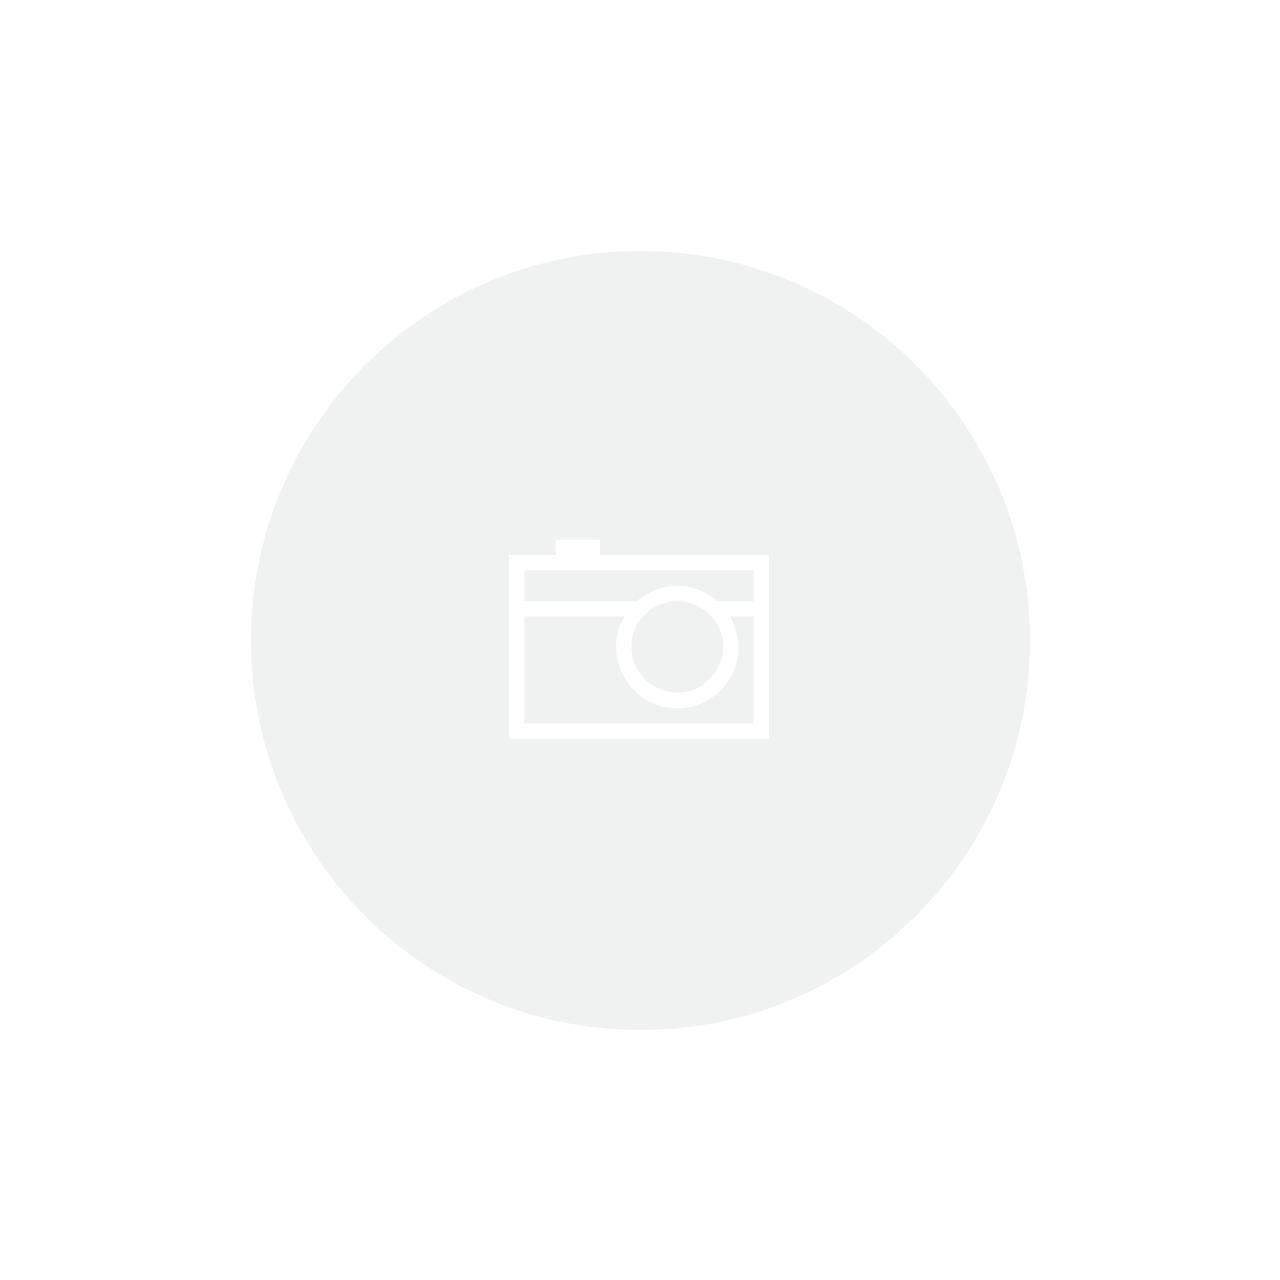 CICLOCOMPUTADOR 21F TSW 3500 C/ LUZ